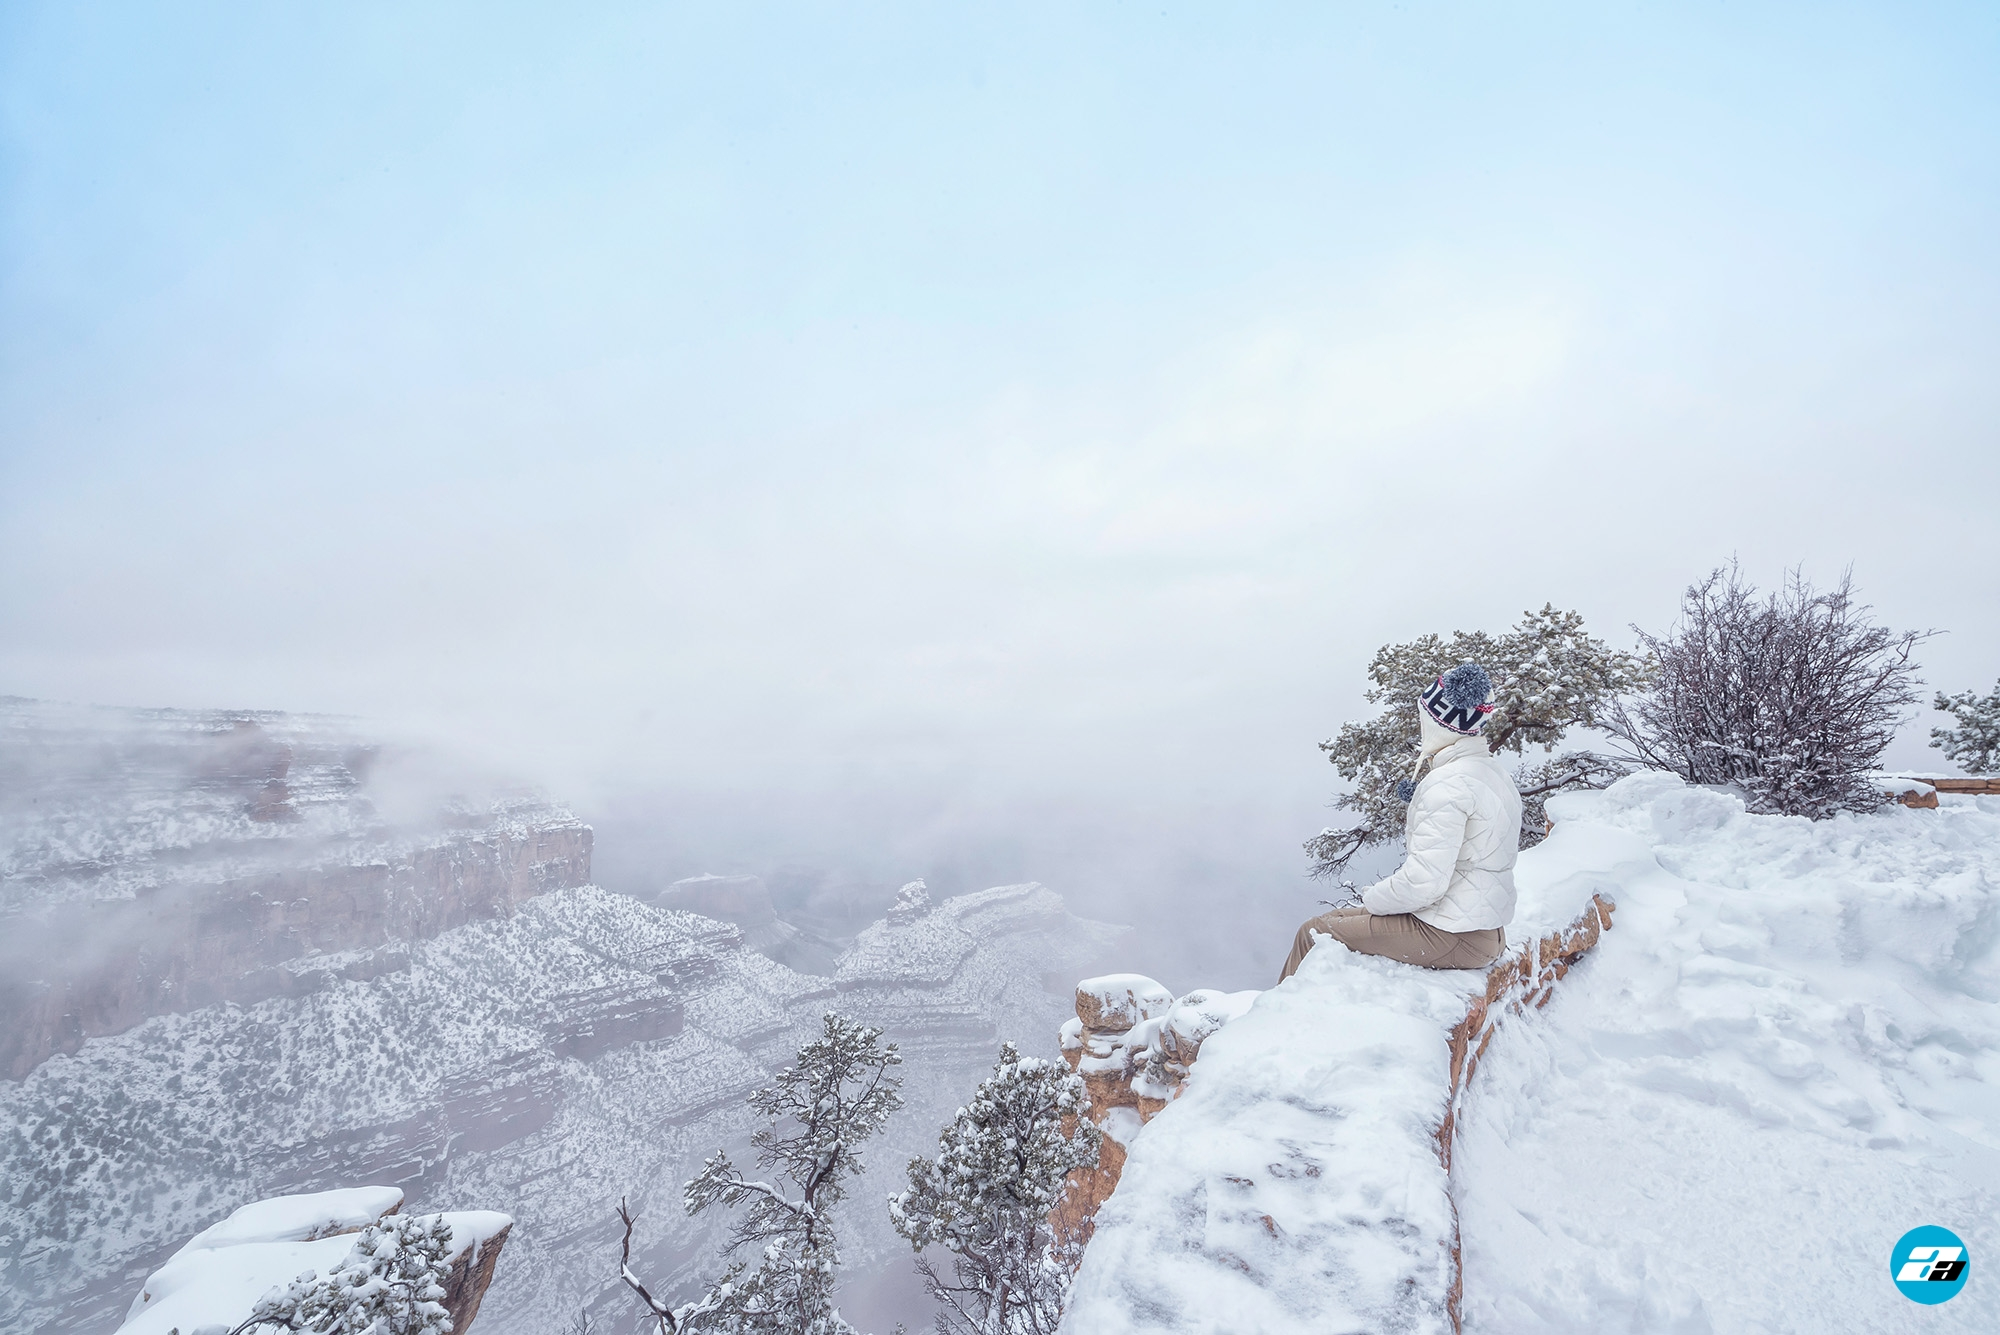 Grand Canyon National Park, Arizona, USA. Canyon View. Explorer. Winter Season. Arizona Attraction & Travel. Canyon Snow. Fog & Mist.